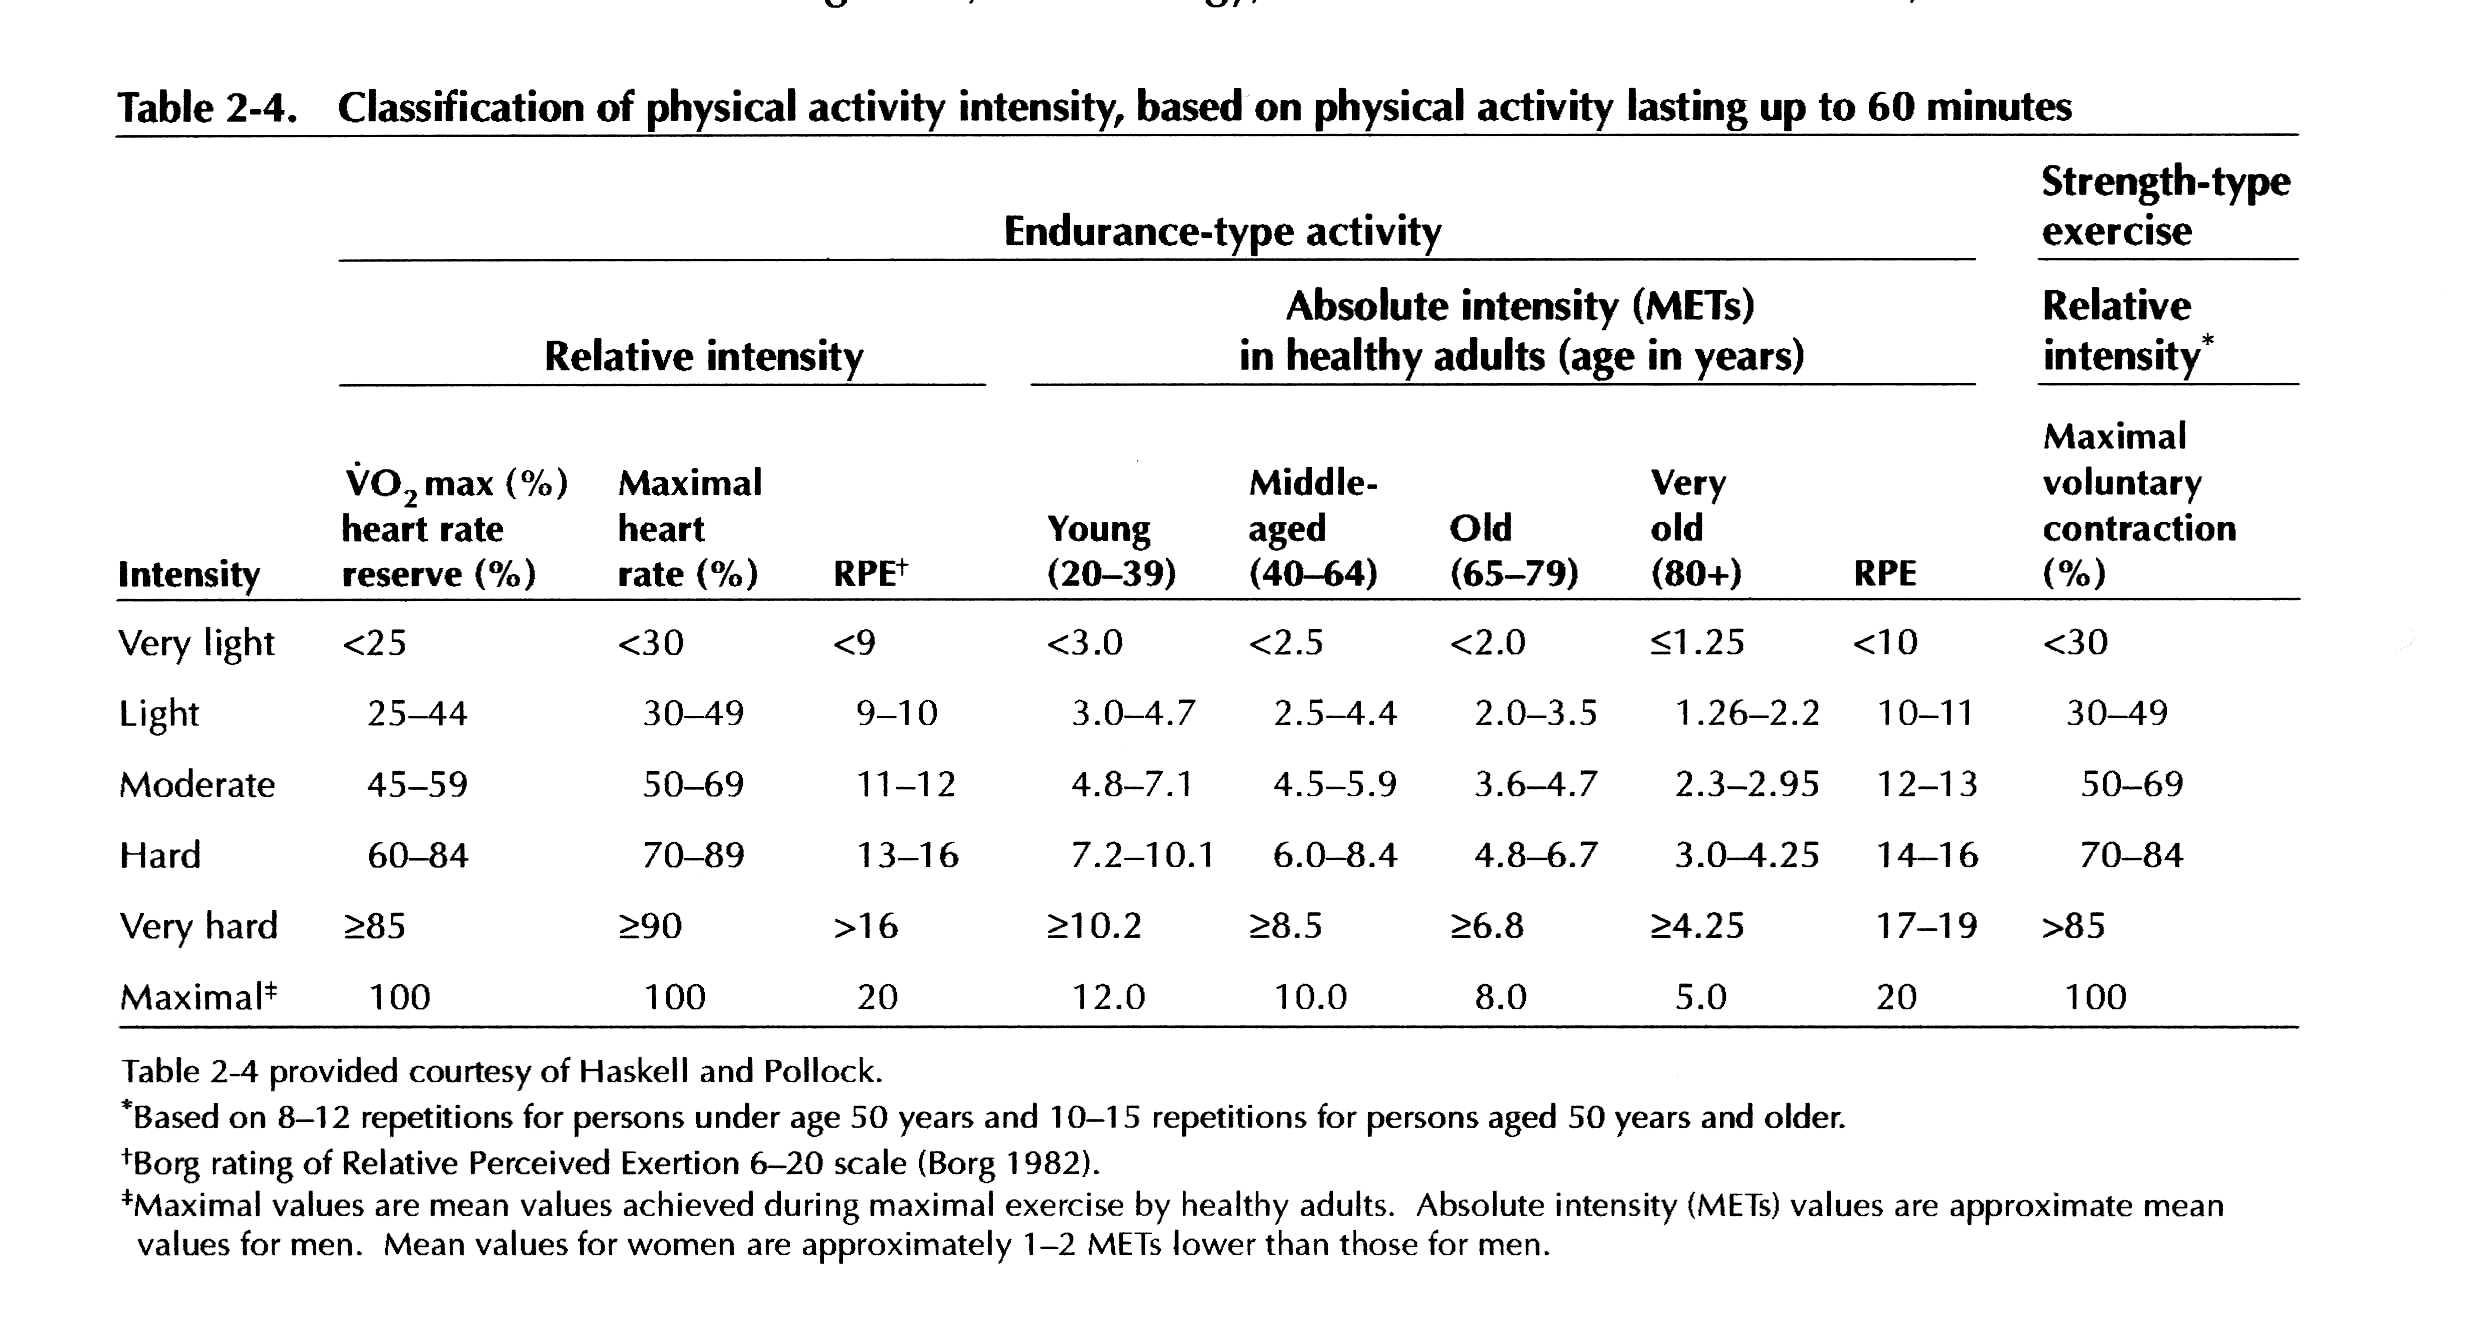 exercise to increase endurance rh ouhsc edu ACSM CVD Risk Factors Table ACSM Doctor Supervision